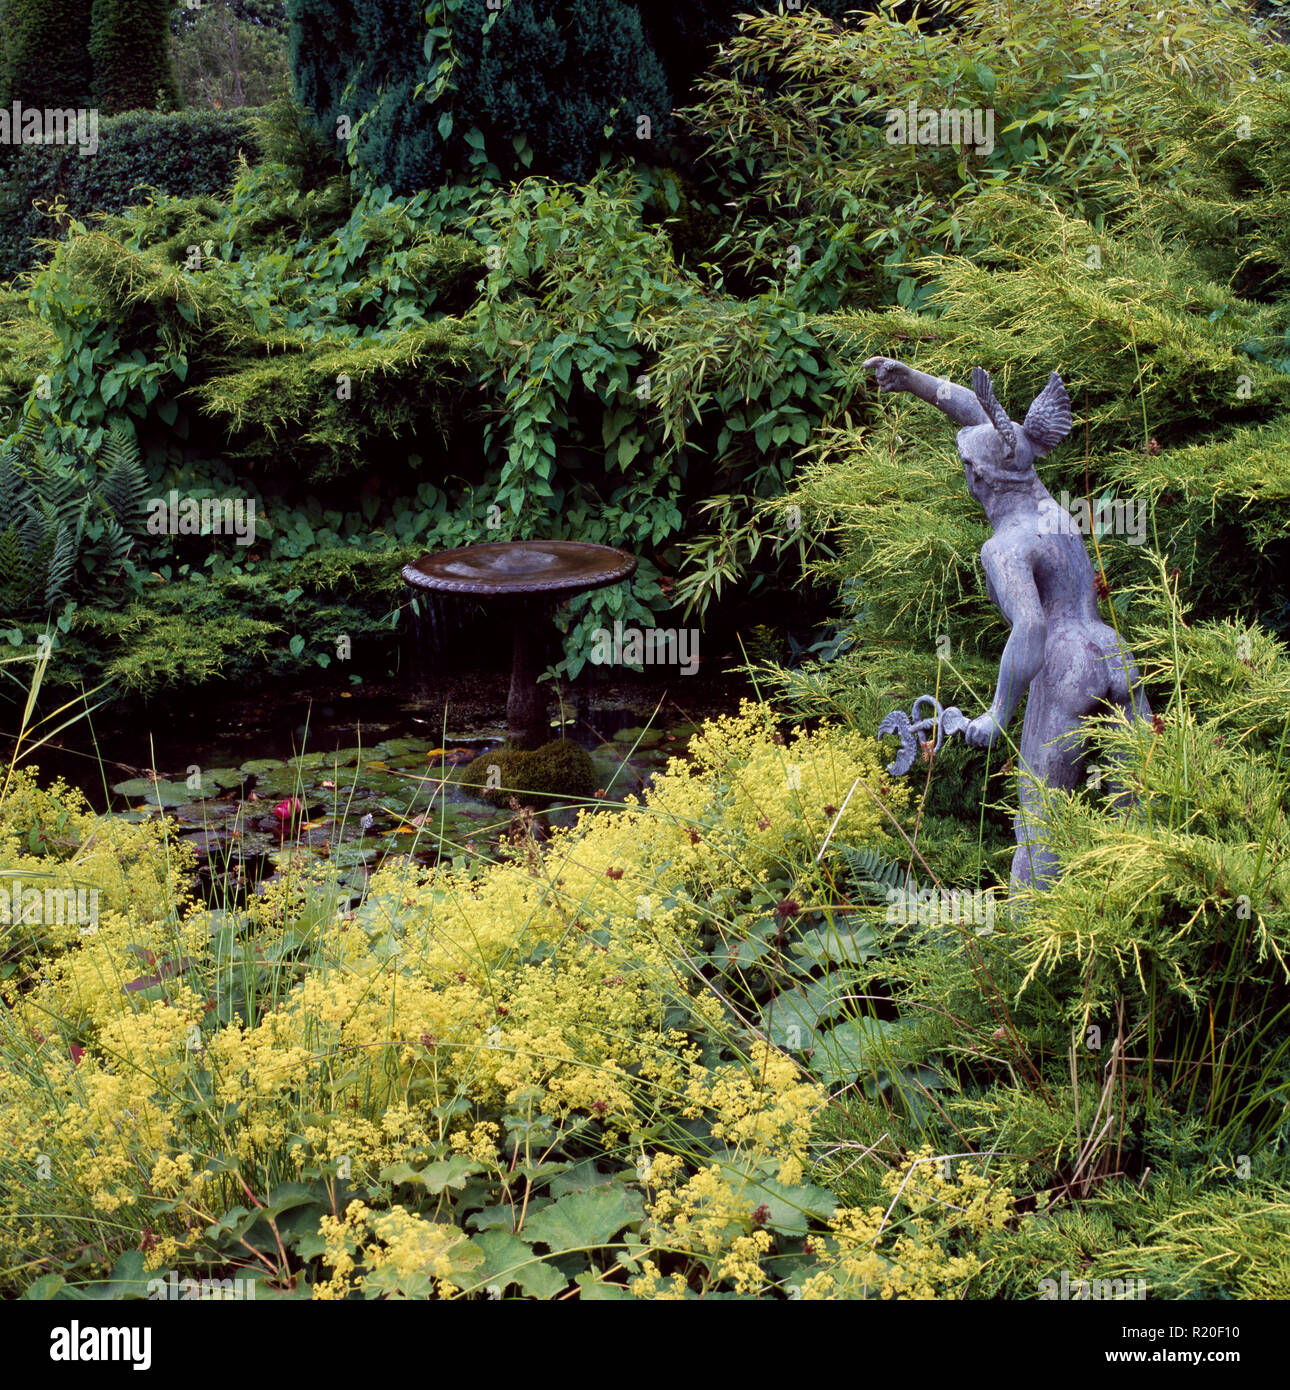 Statue among alchemilla mollis beside water feature - Stock Image